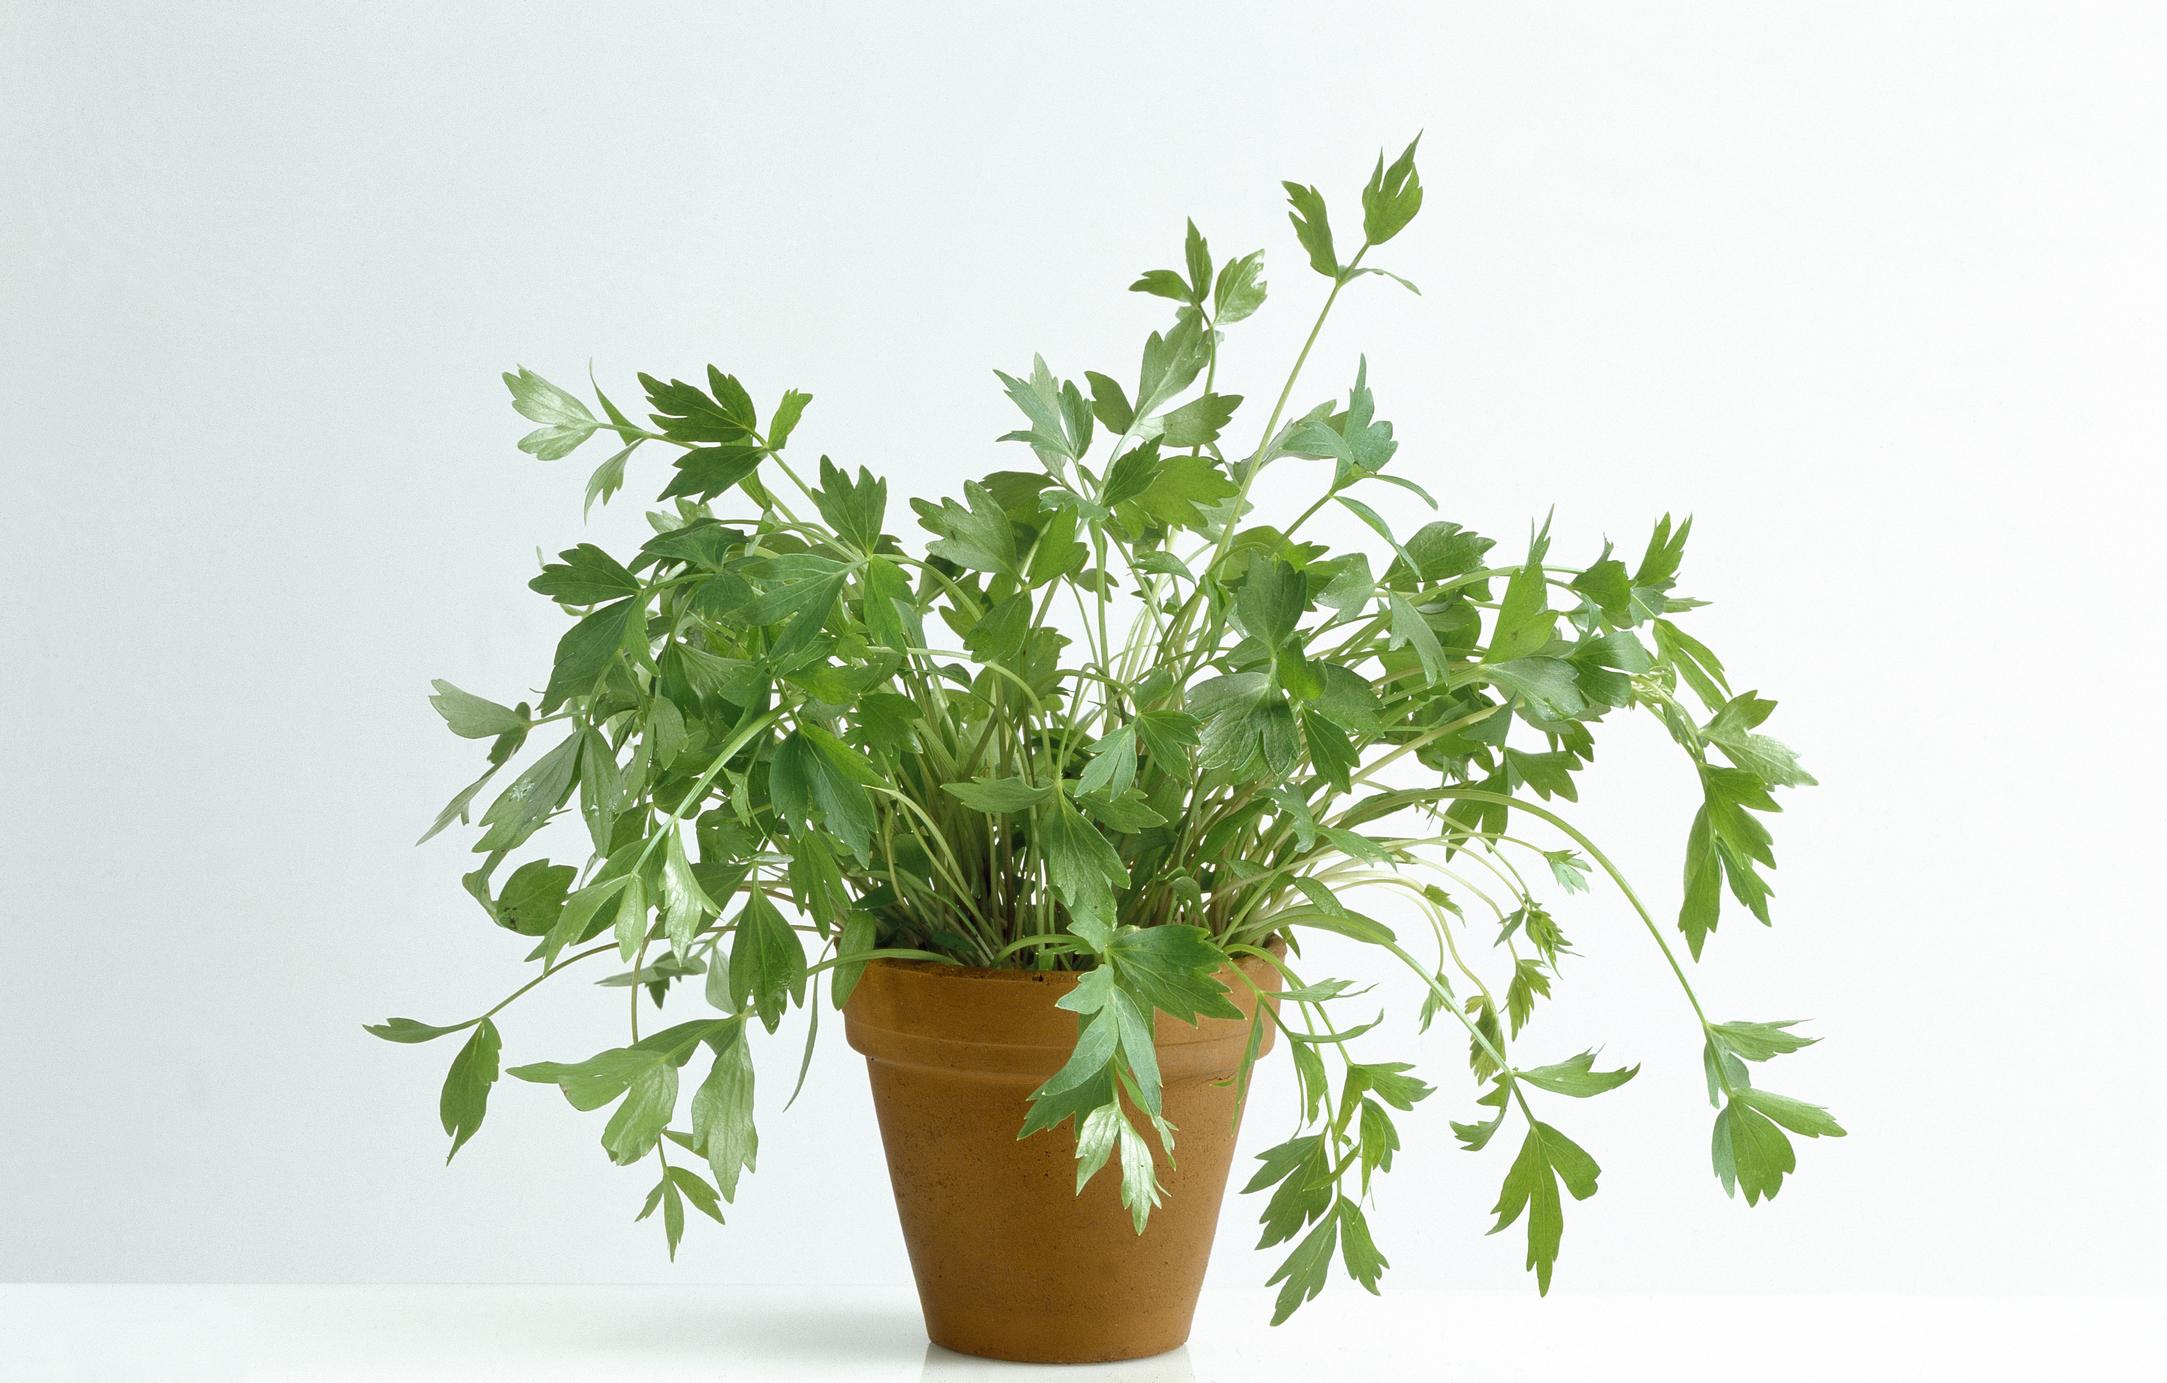 Uncommon Herbs: Lovage